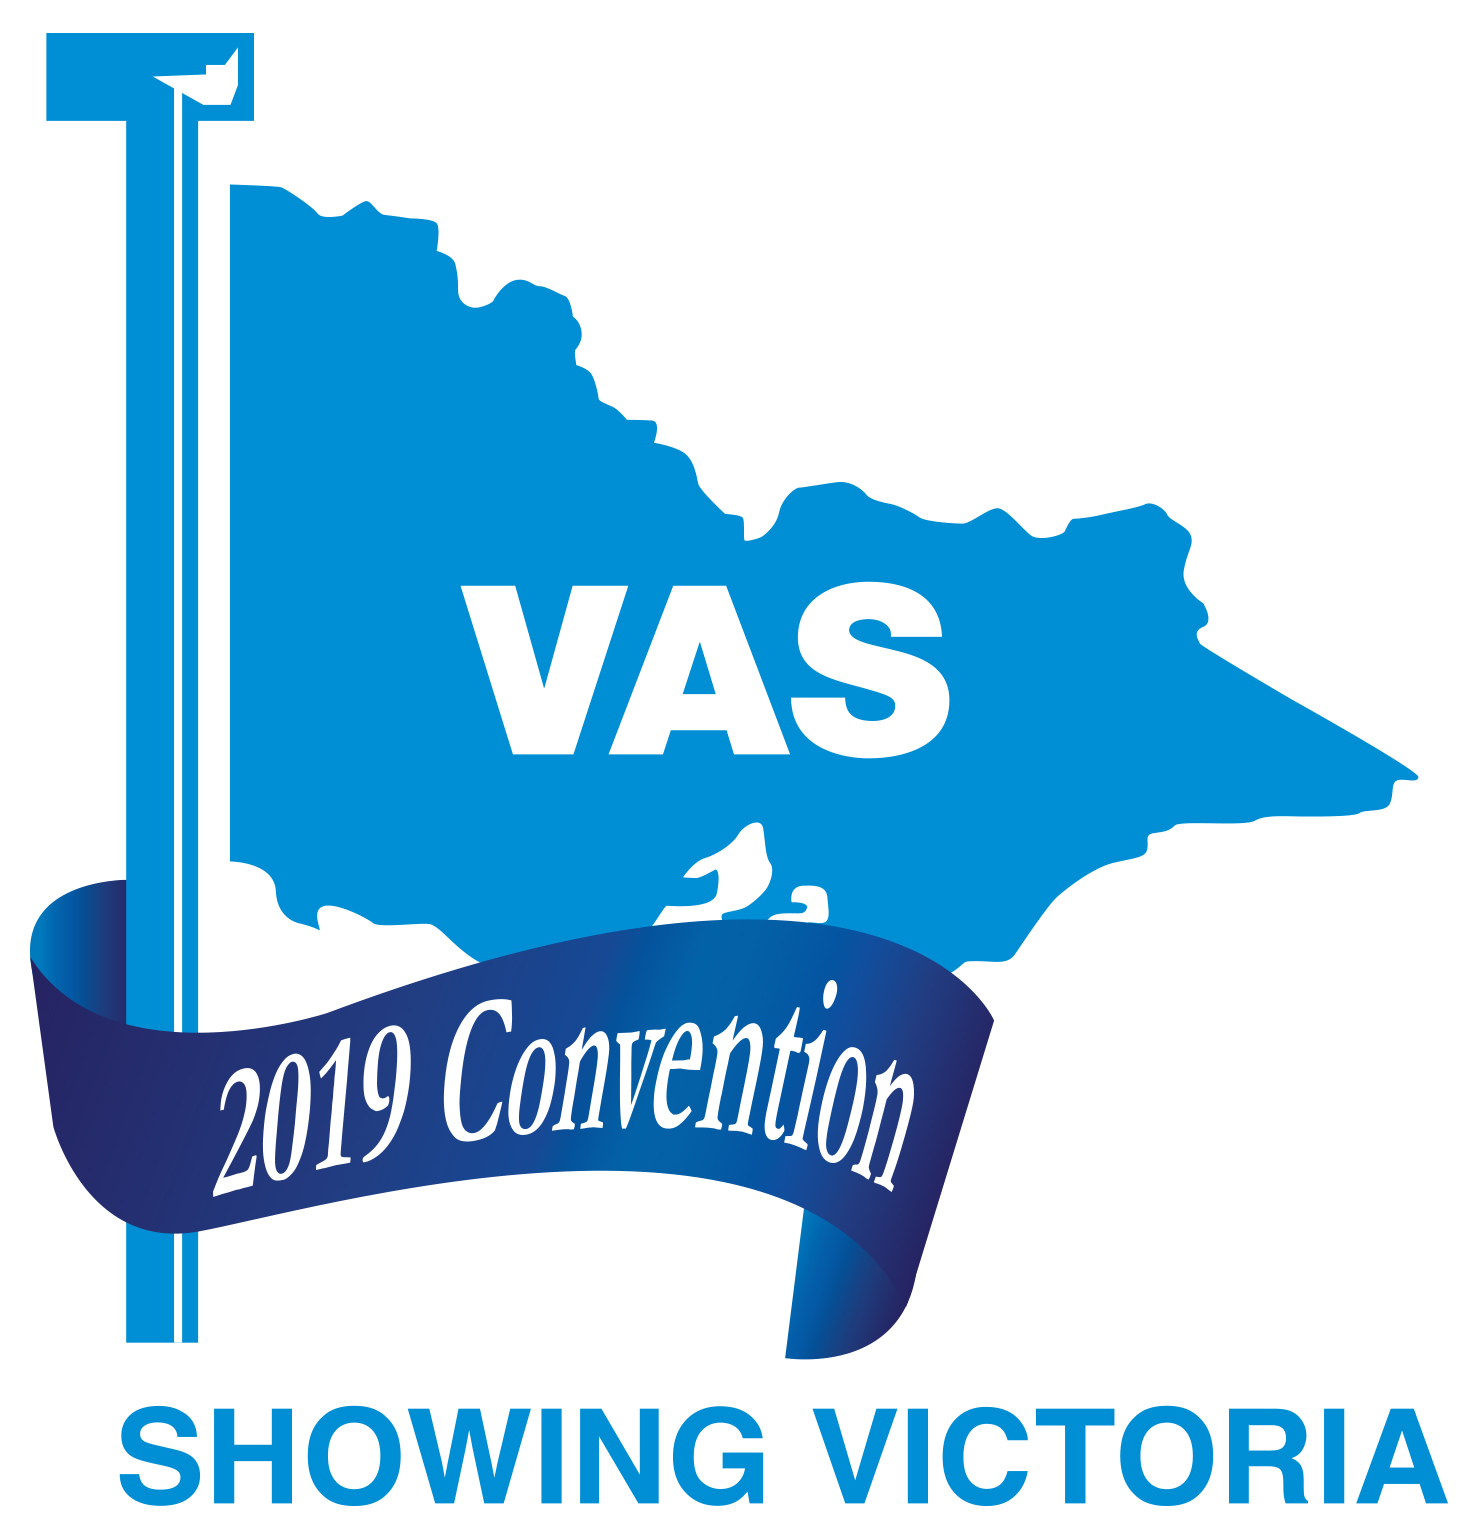 VAS LOGO 2019 Convention.jpg